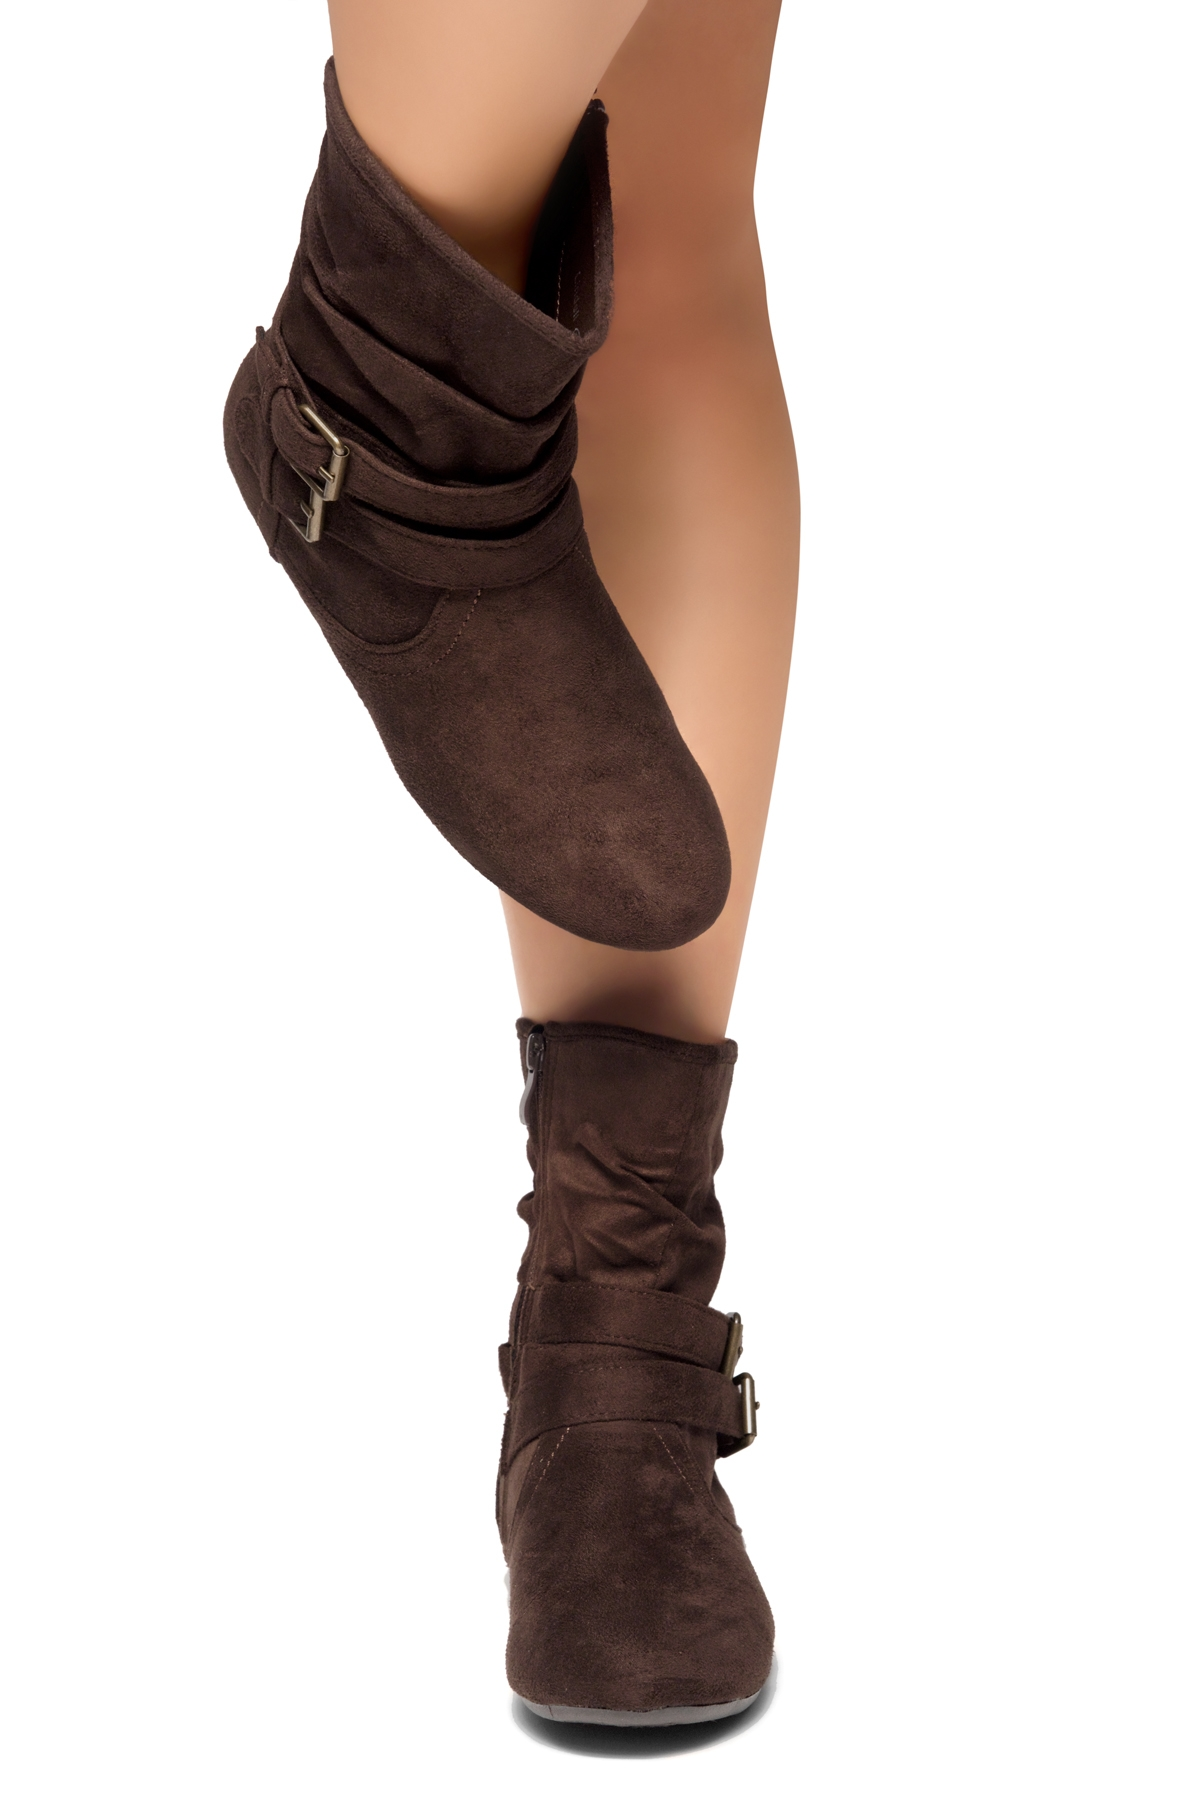 898c19f9614cc0 Women s Brown Lindell Women s Fashion Calf Flat Heel Side Zipper ...